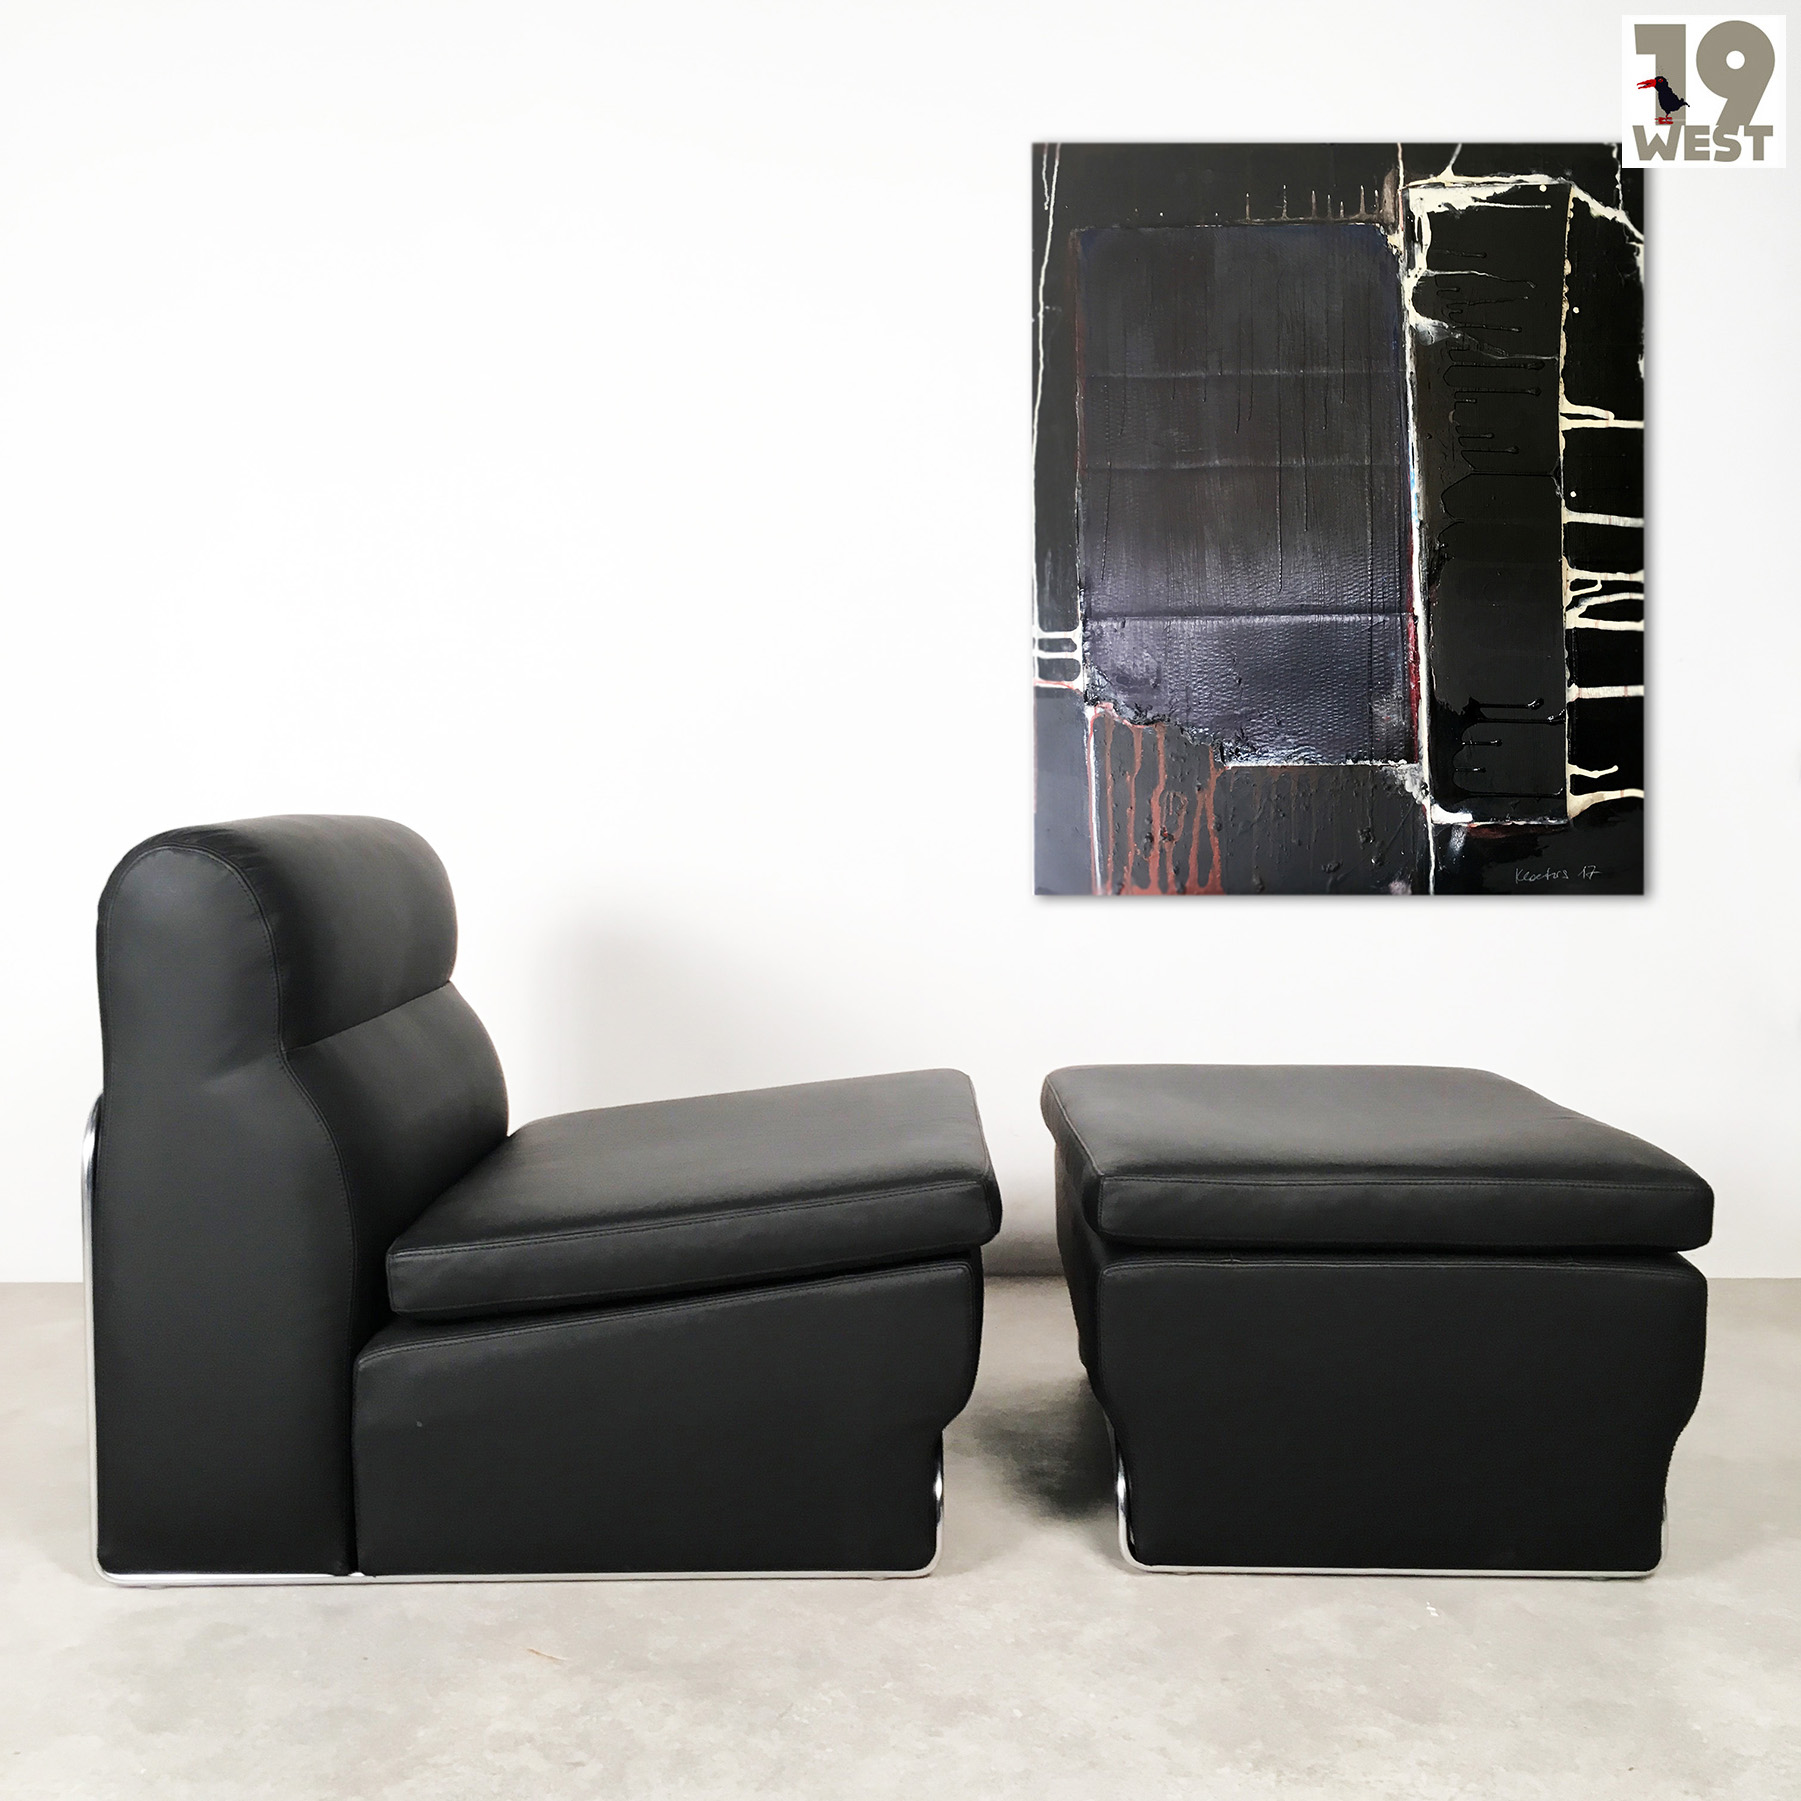 horst-bruningleather-lounge-chair-ottoman-horst-bruning-for-kill-international